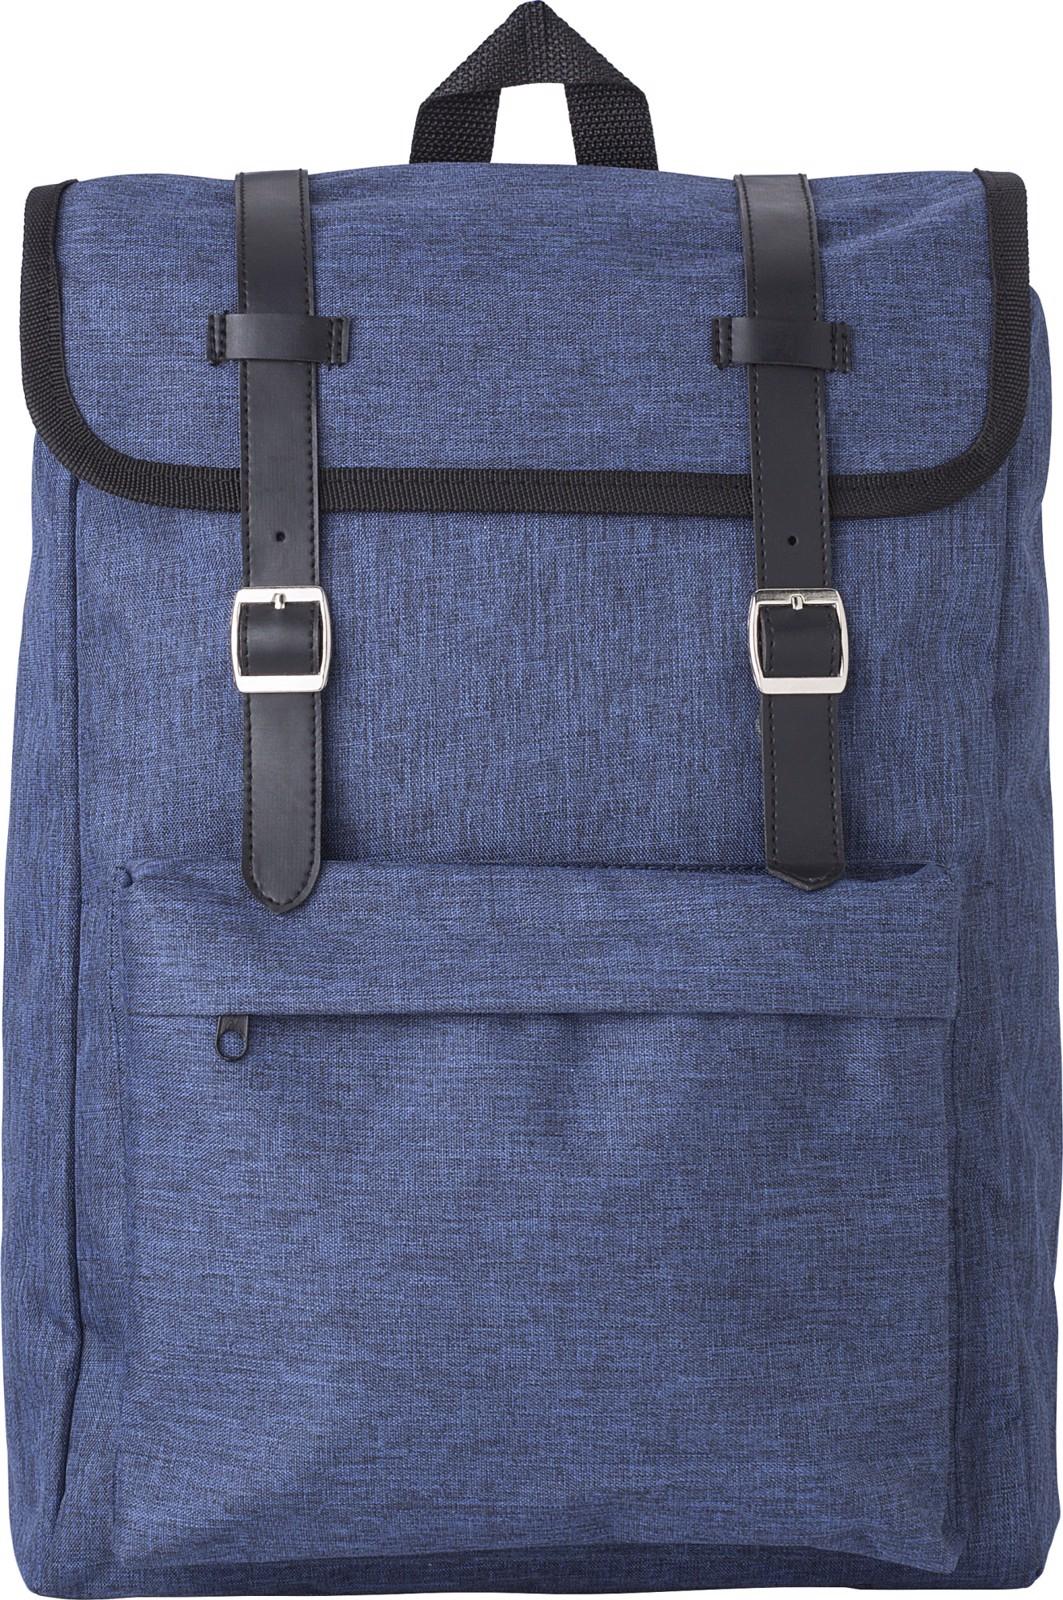 Polyester (210D) backpack - Blue